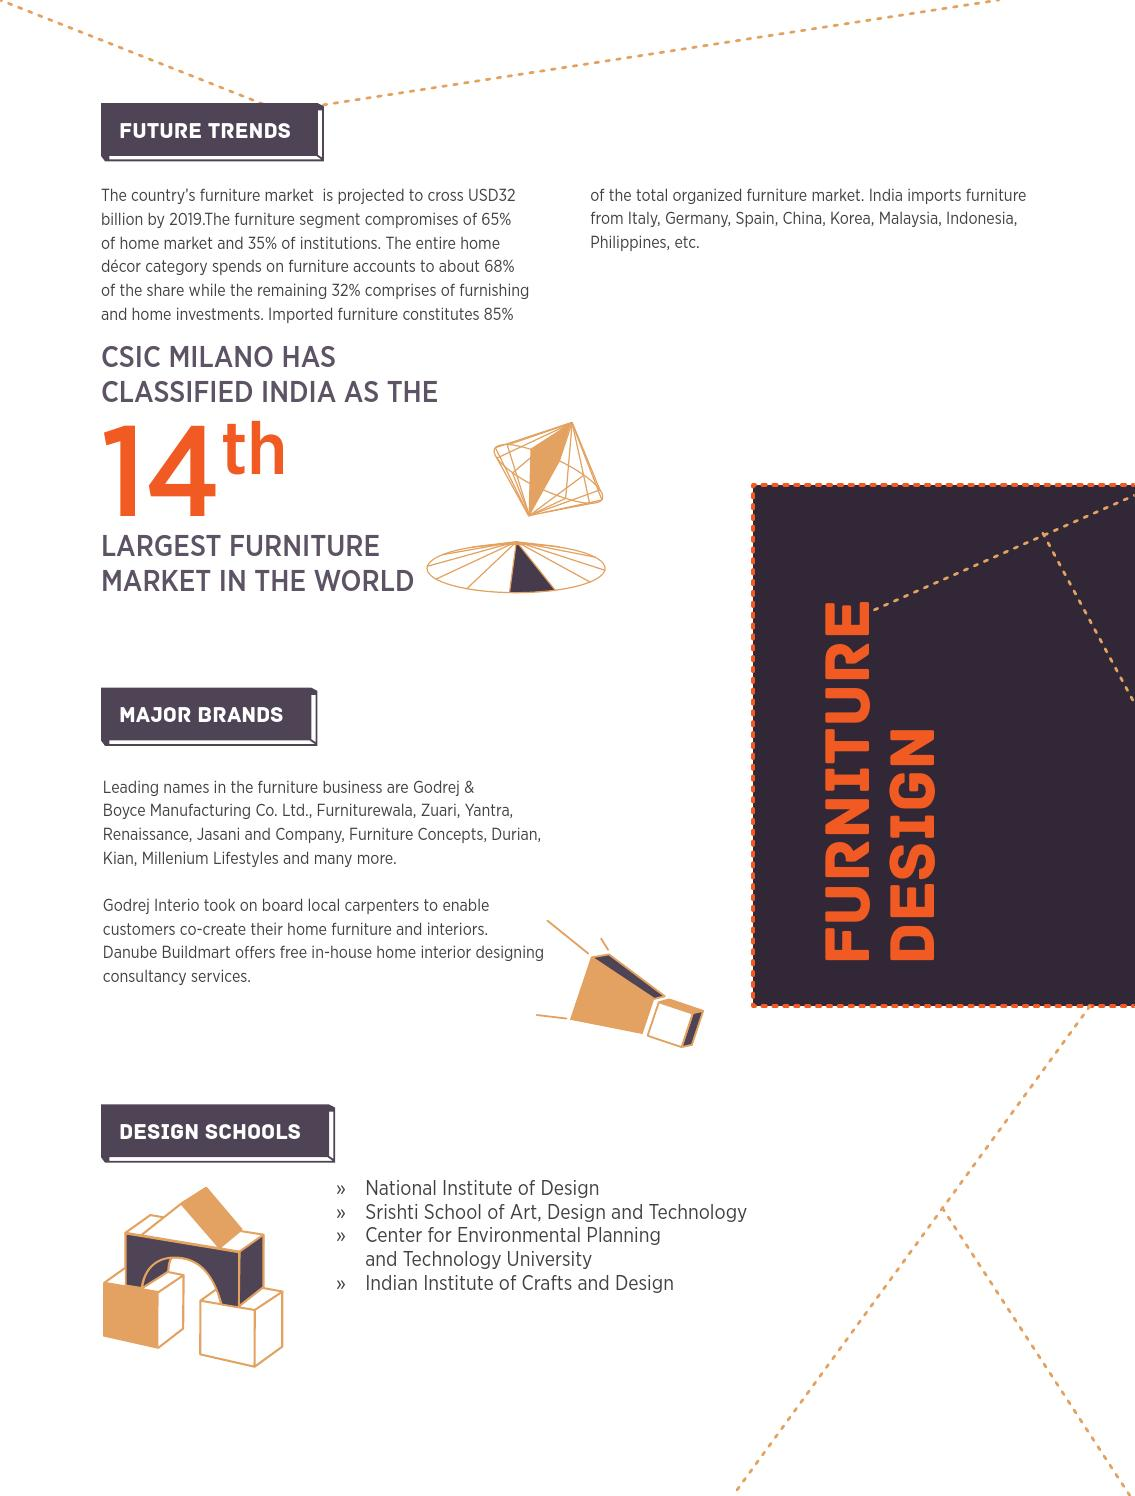 india design report 2015 by rmalhotra02 issuu